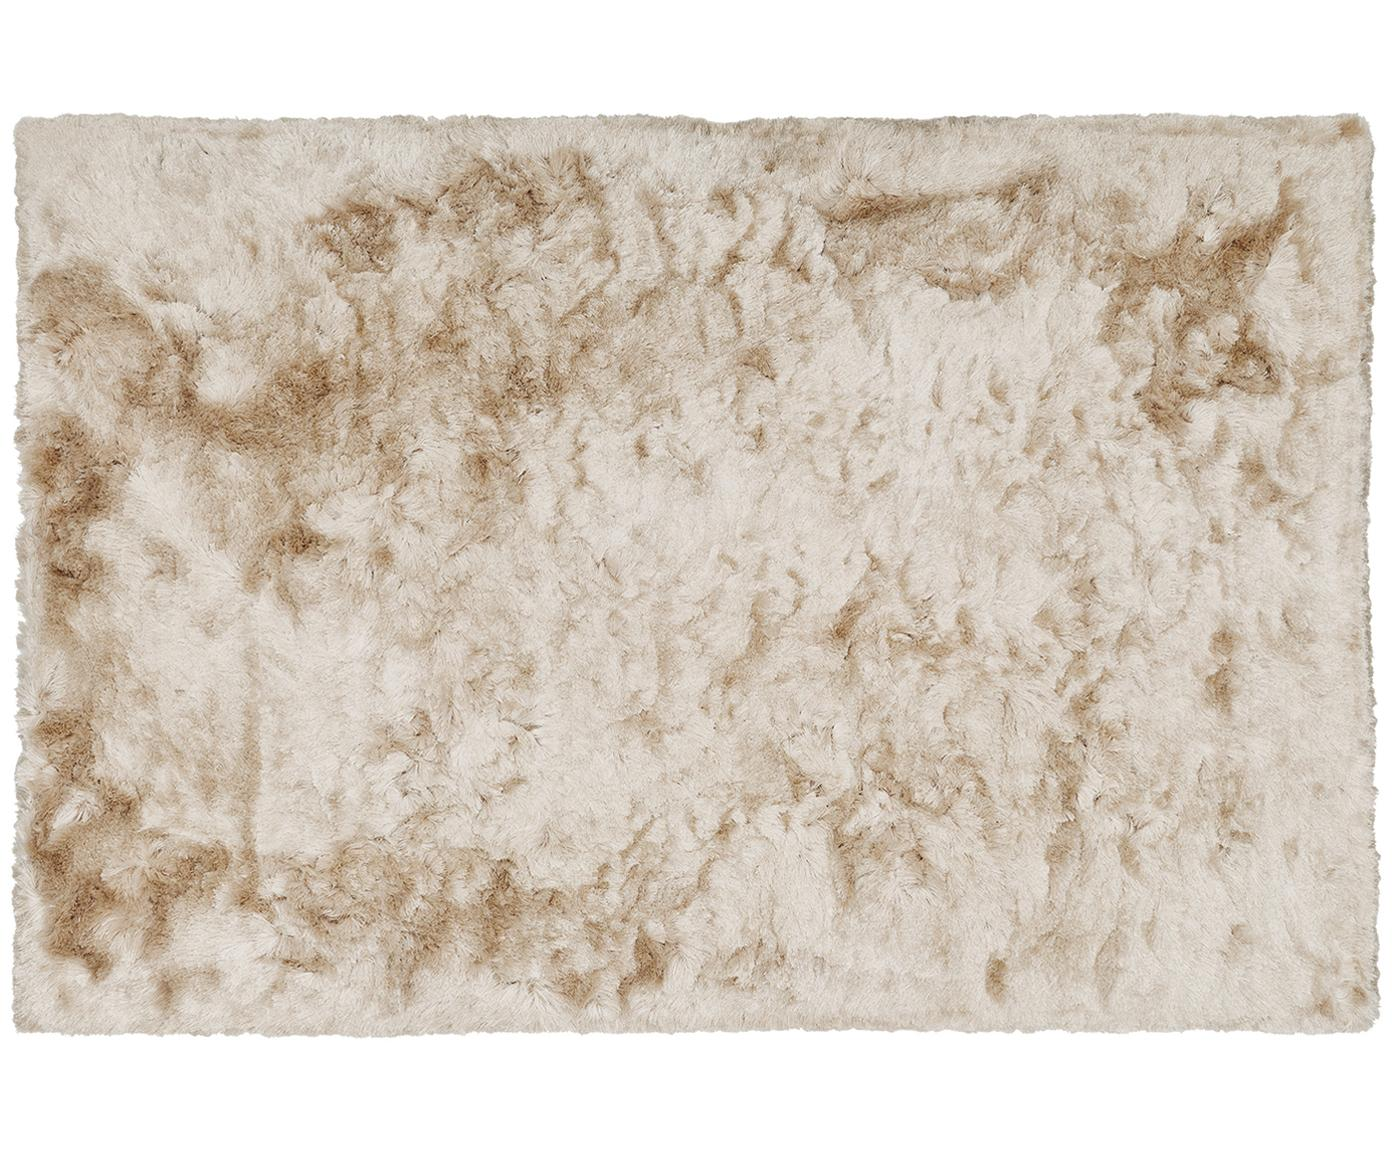 Alfombra artesanal de pelo largo Jimmy, Parte superior: 100%poliéster, Reverso: 100%algodón, Marfil, An 120 x L 180 cm (Tamaño S)